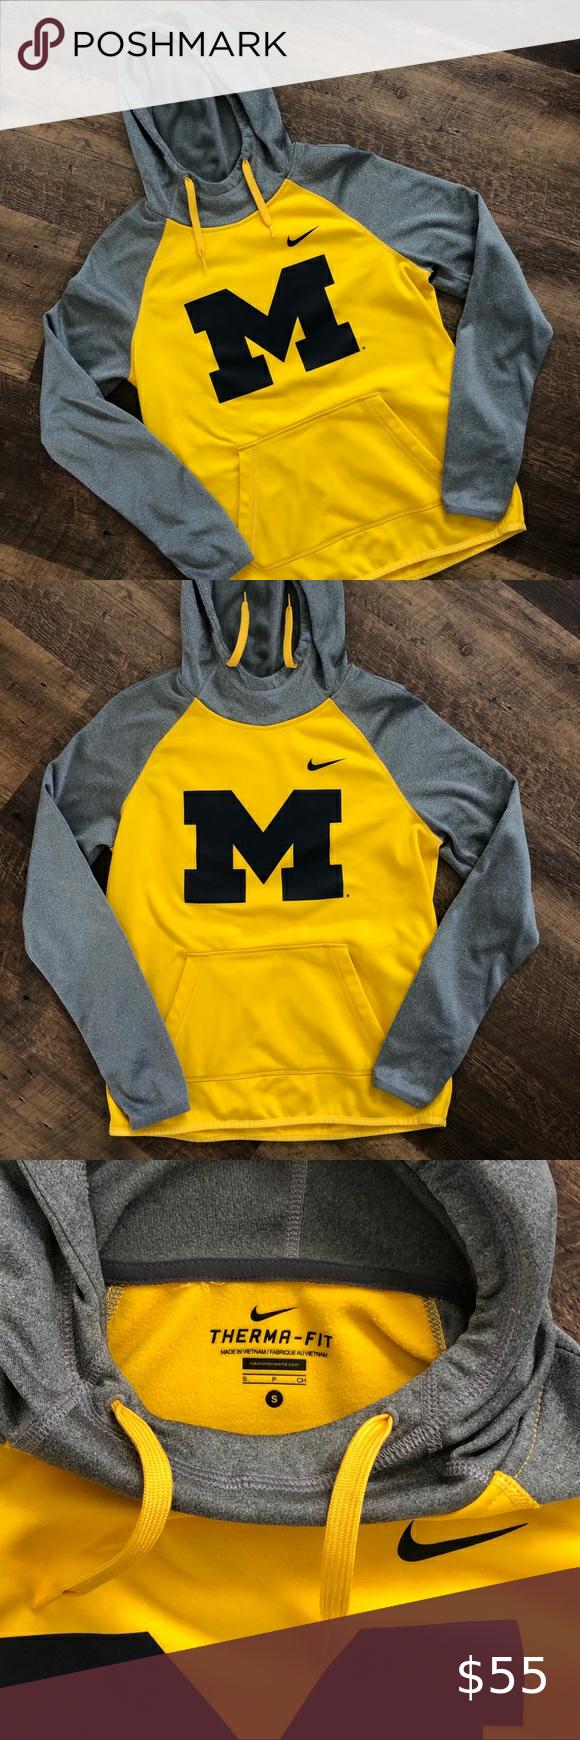 University Of Michigan Nike Sweatshirt Nike Sweatshirts Sweatshirts Sweatshirts Hoodie [ 1740 x 580 Pixel ]